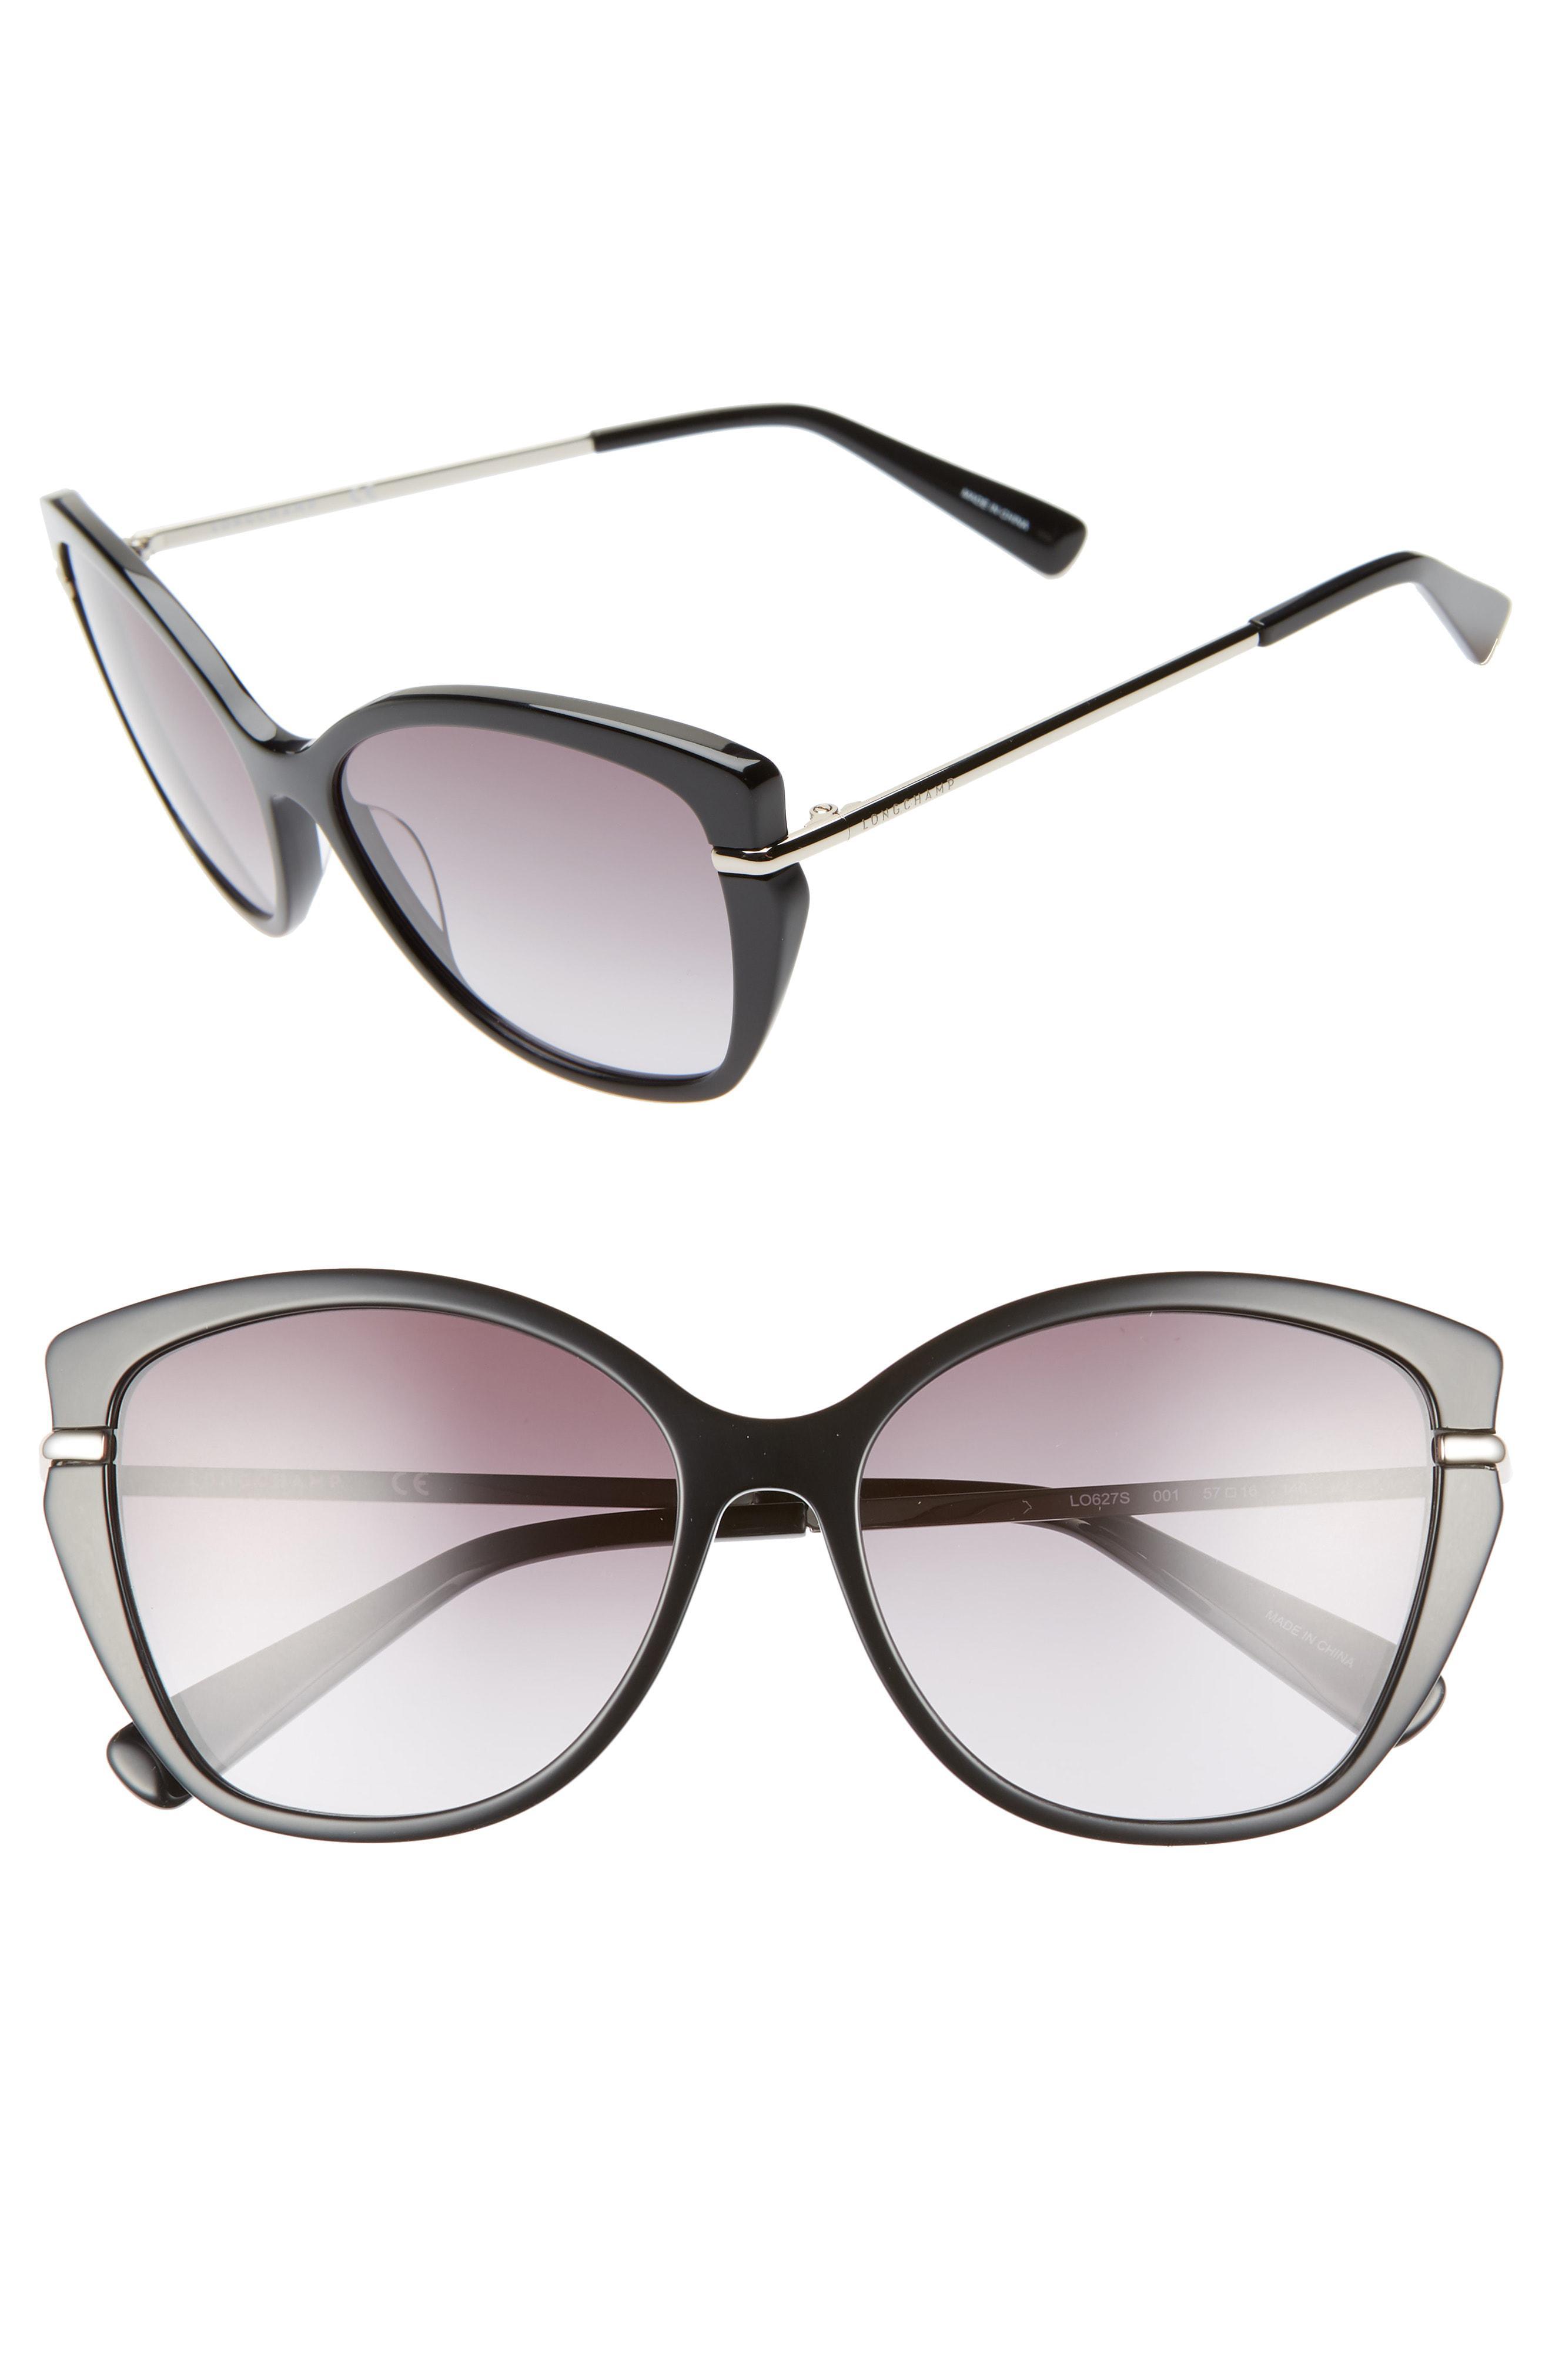 d64552d531 Lyst - Longchamp Heritage 57mm Butterfly Sunglasses in Black